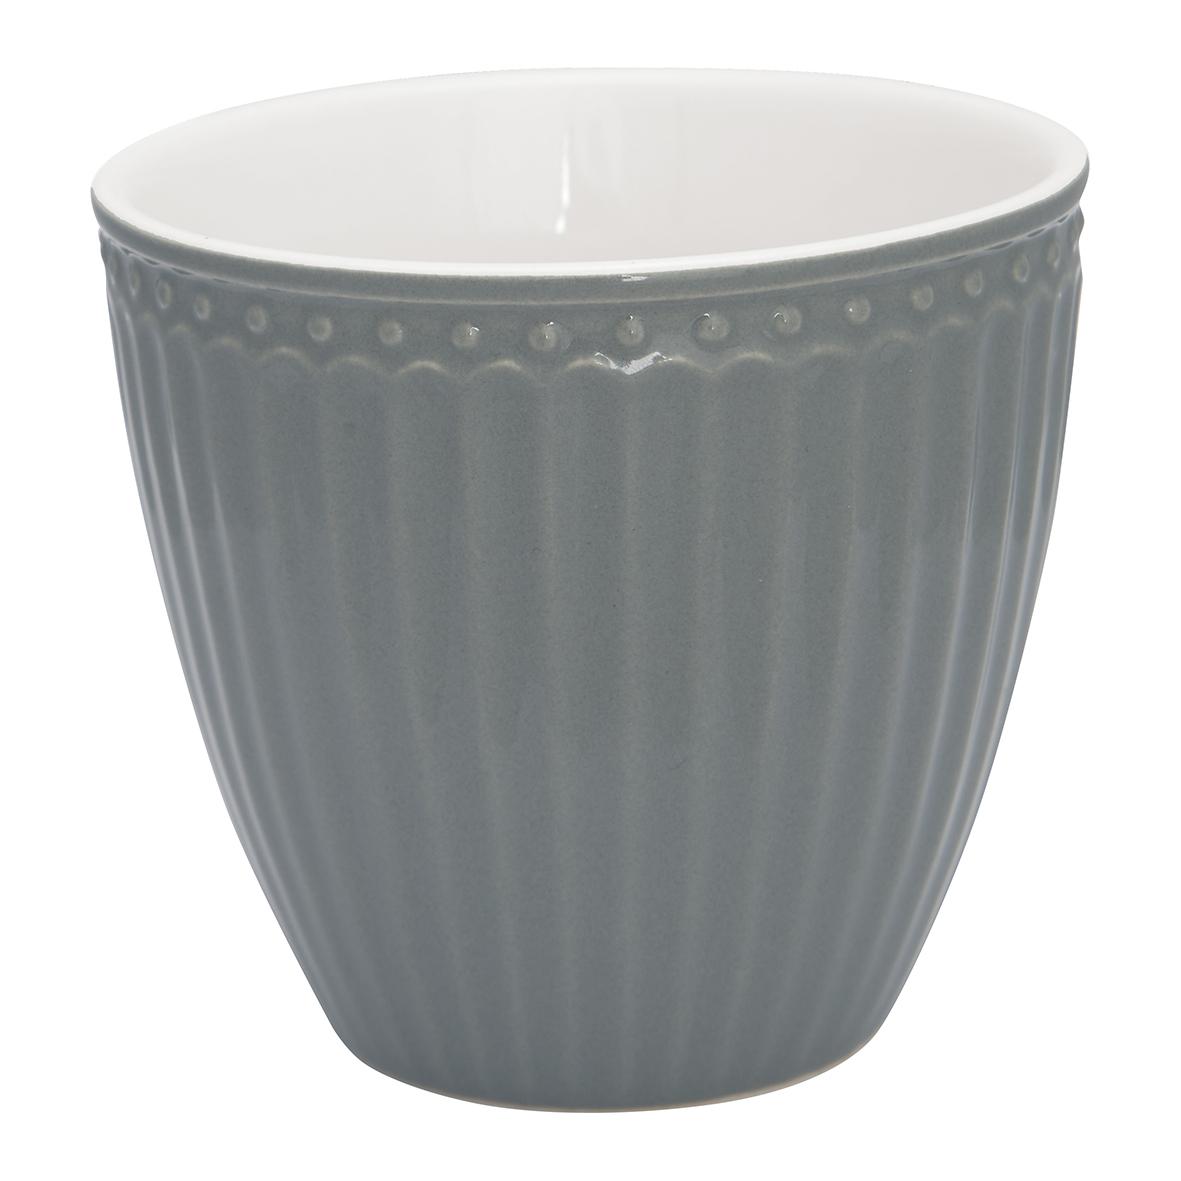 Latte Cup - Alice stone grey - Greengate